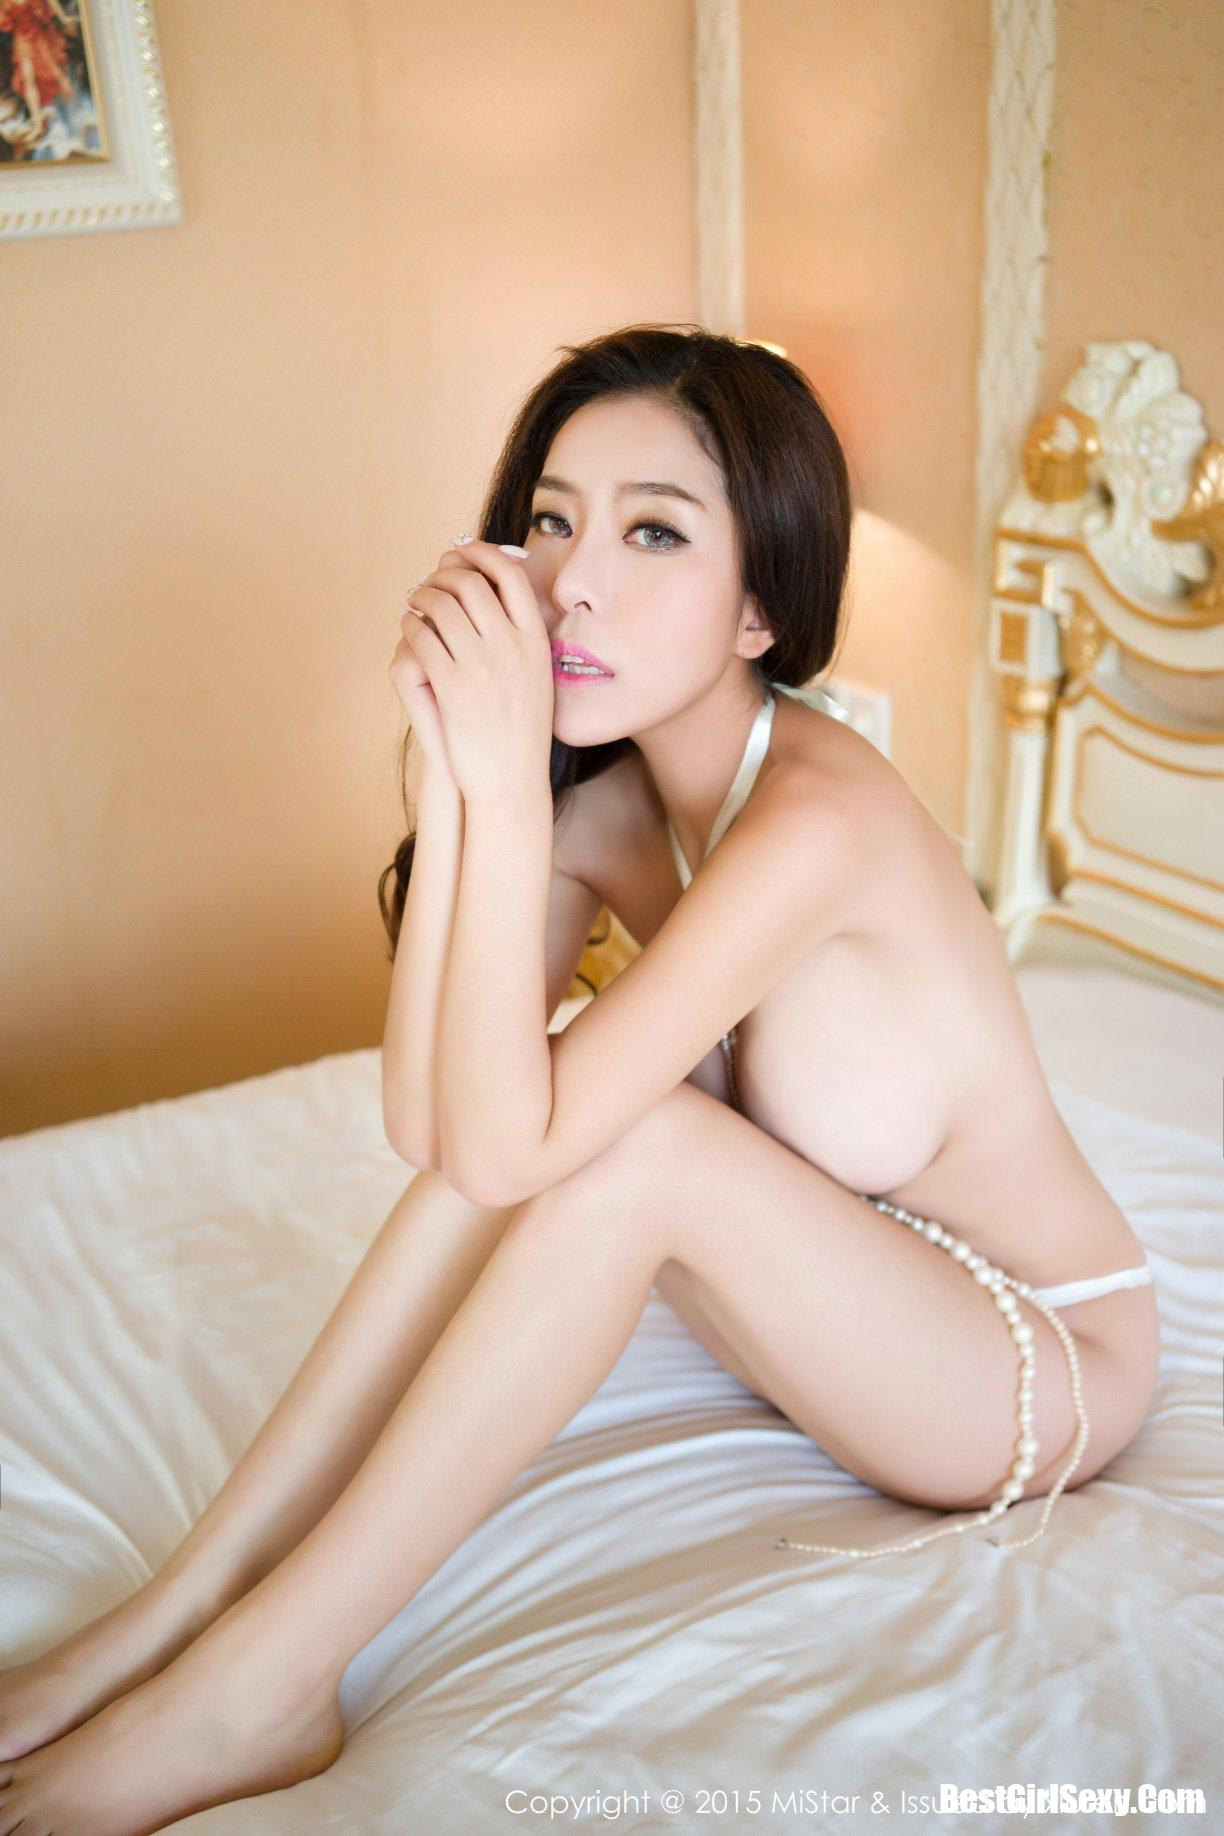 陈欣, MiStar魅妍社 Vol.032 Chen Xin, MiStar魅妍社 Vol.032, Chen Xin